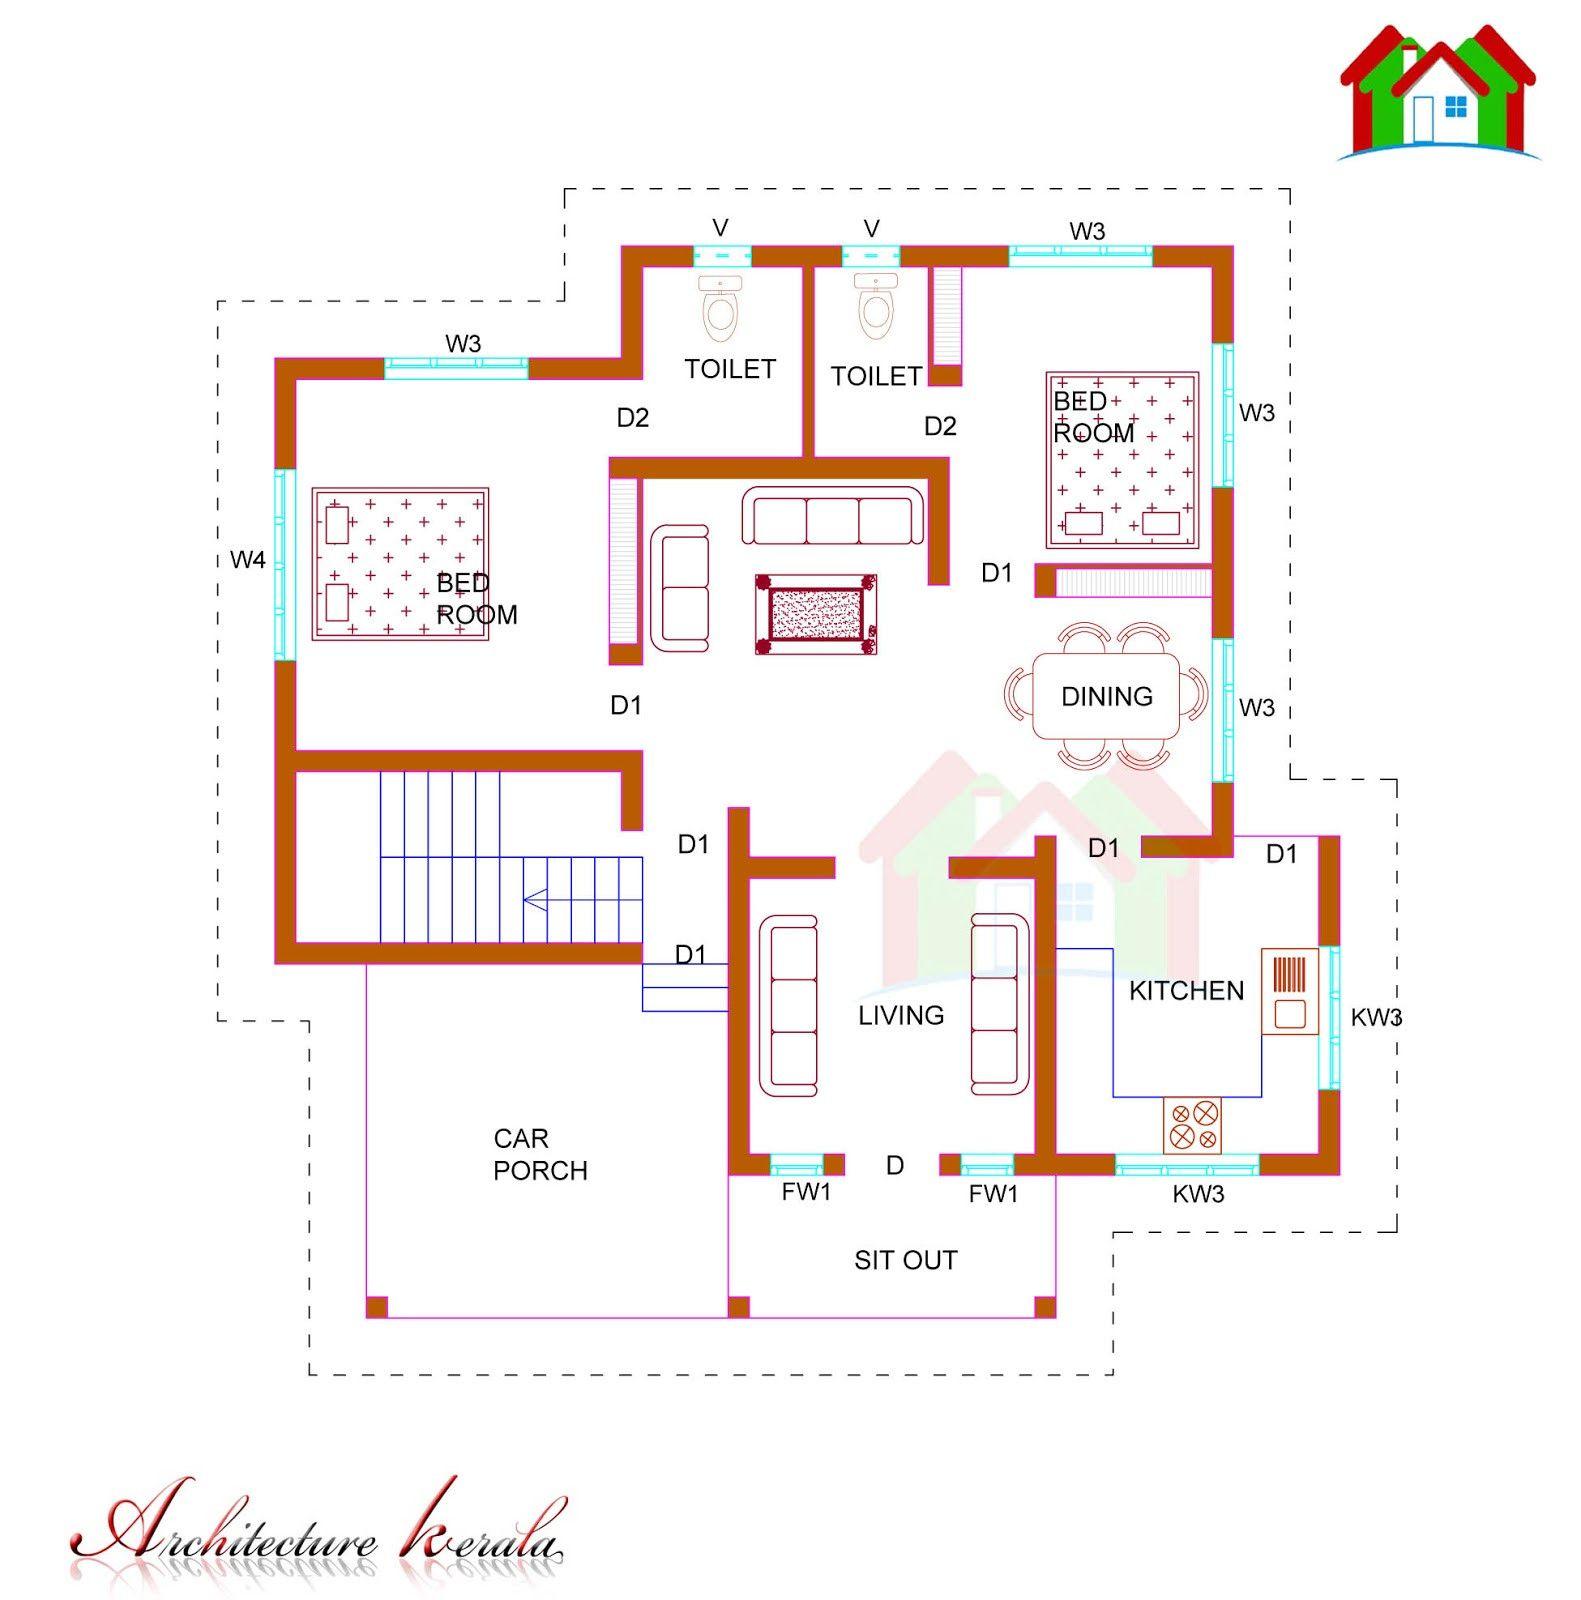 1200 Sq Ft House Plans 3 Bedroom Elegant 1000 Square Feet House Plan Kerala Model Homes Zone House Plans With Photos 1200 Sq Ft House Beautiful House Plans